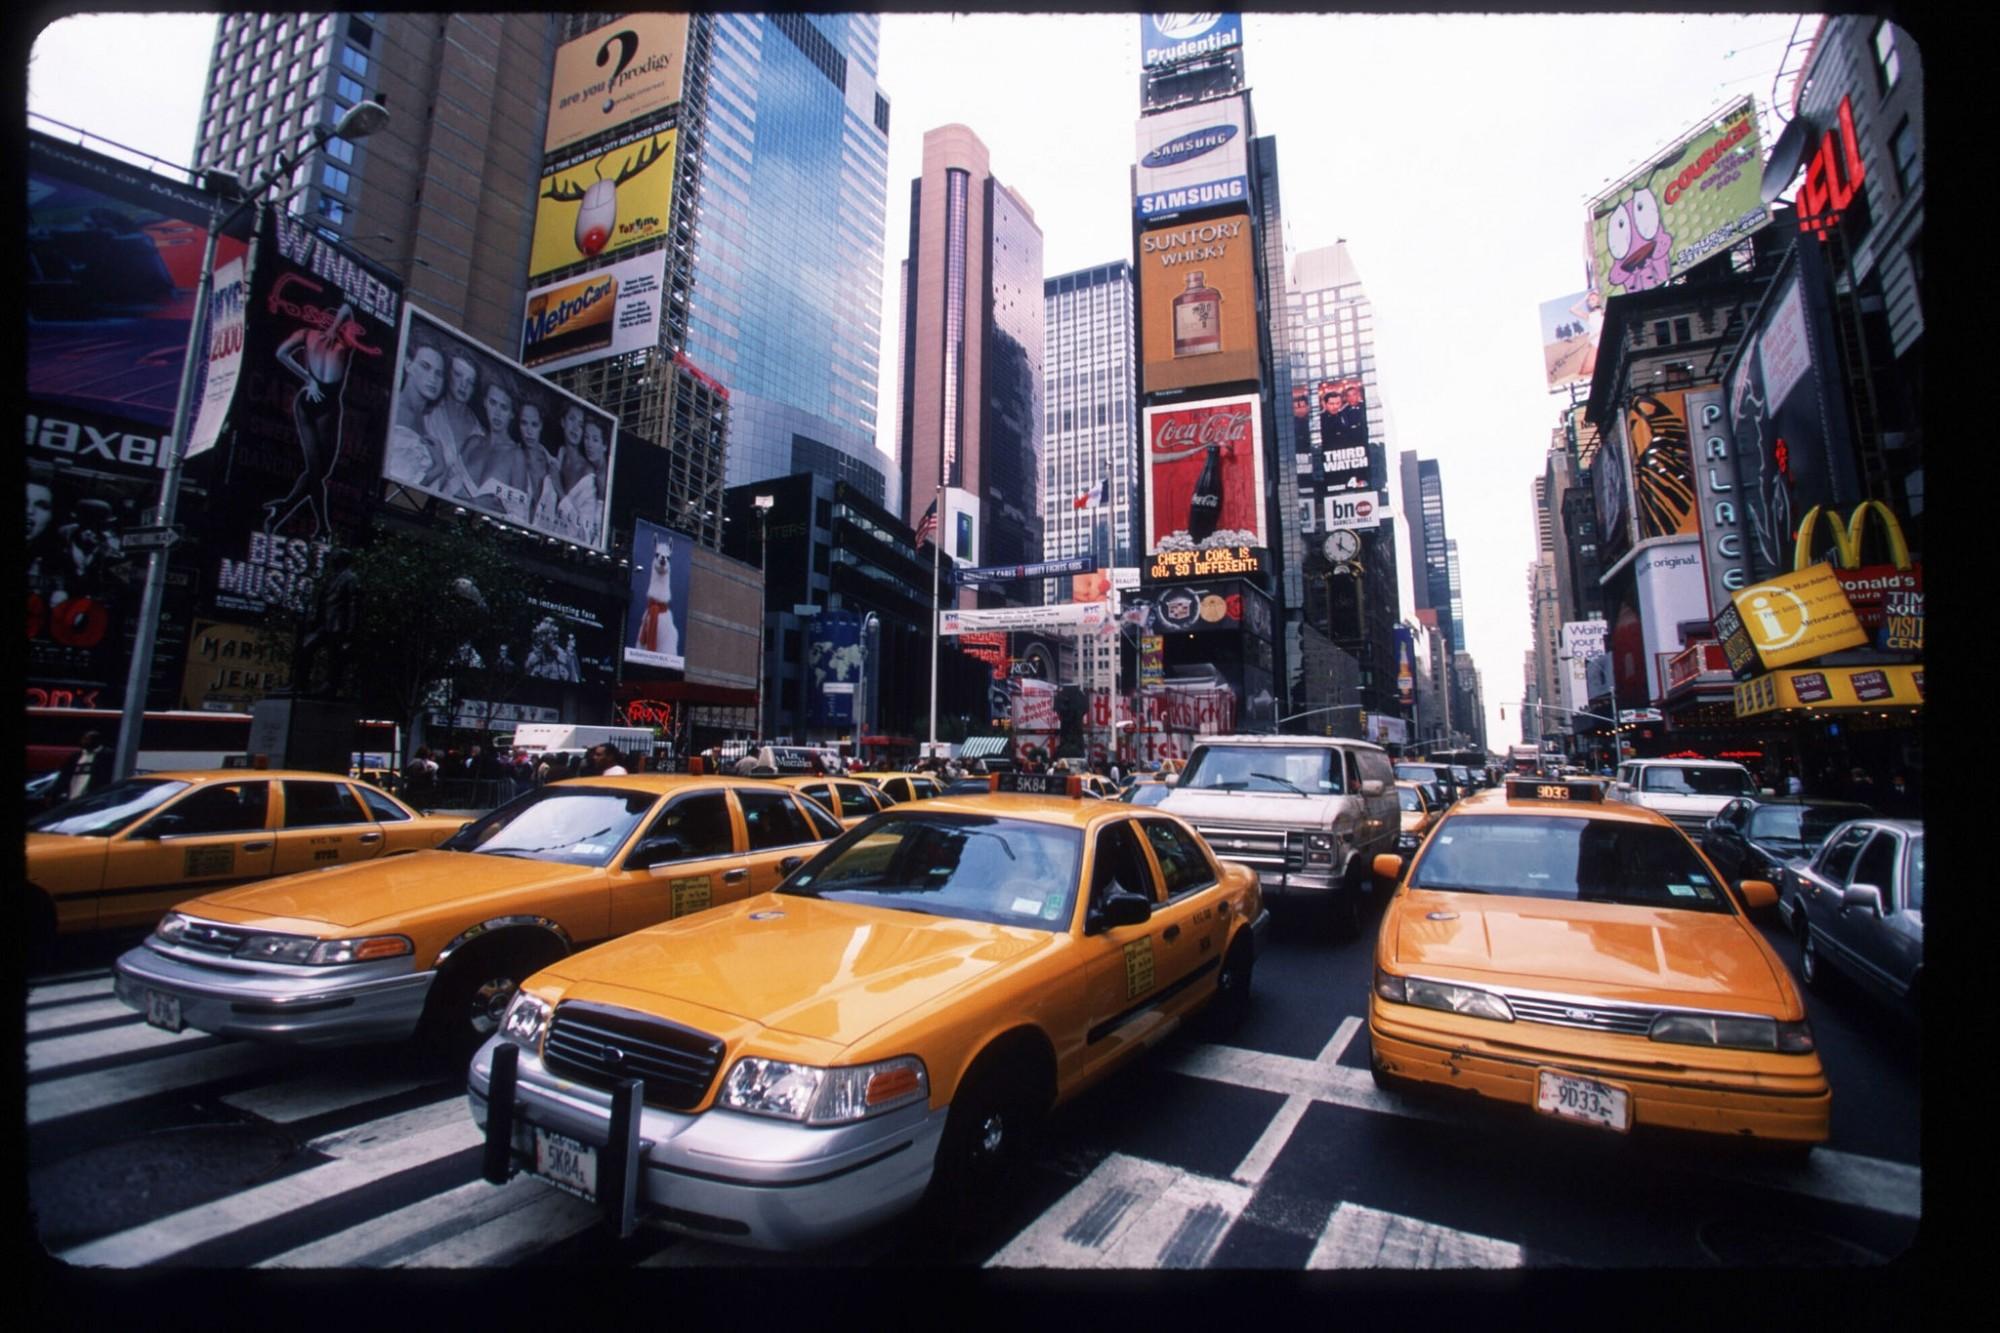 1999 NY Times Square